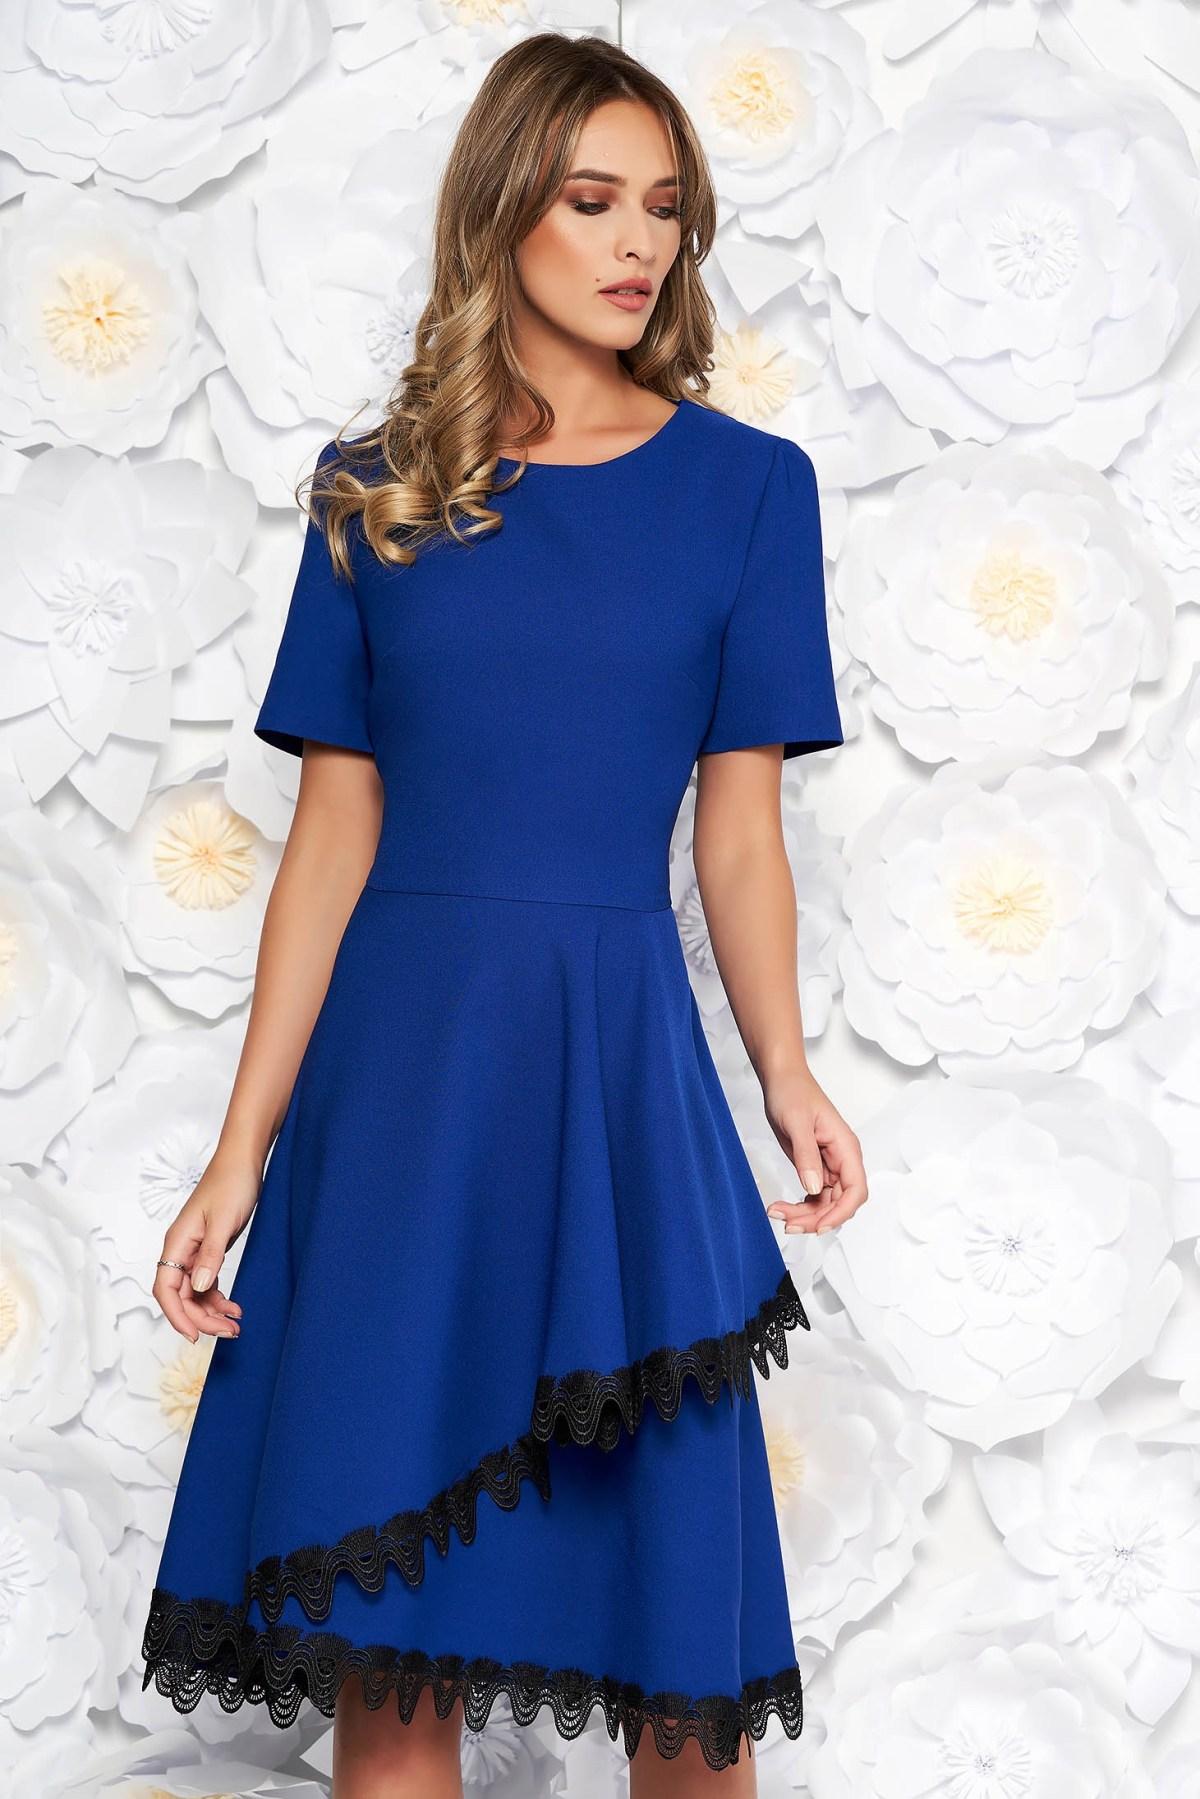 blue elegant midi cloche dress flexible thin fabriccloth